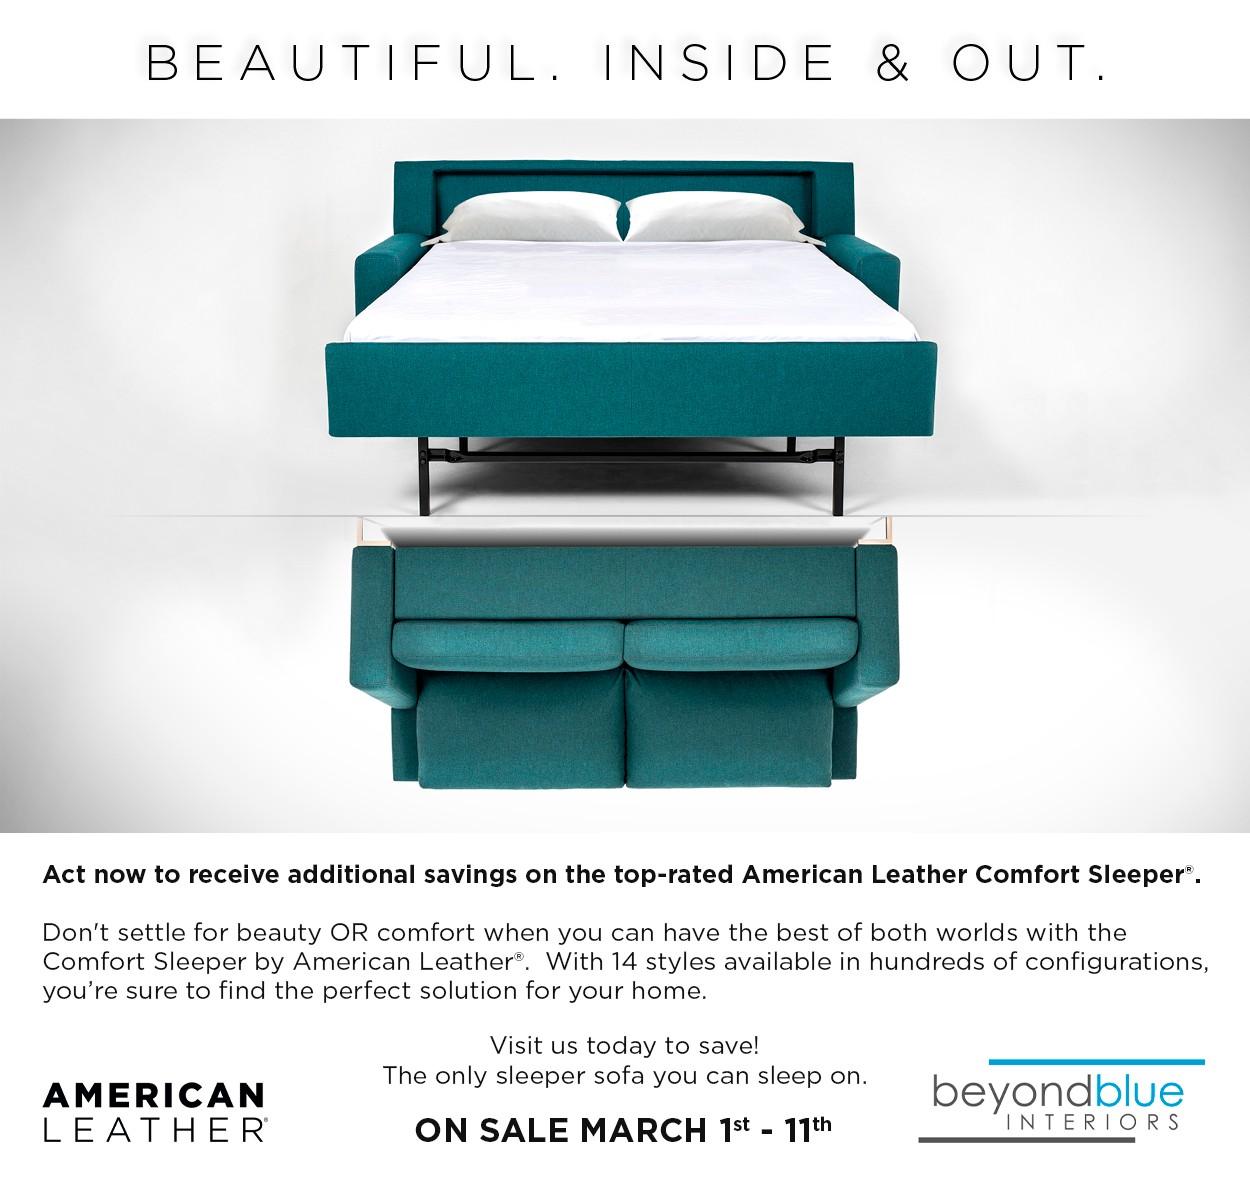 American Leather Comfort Sleeper sale Spring 2019